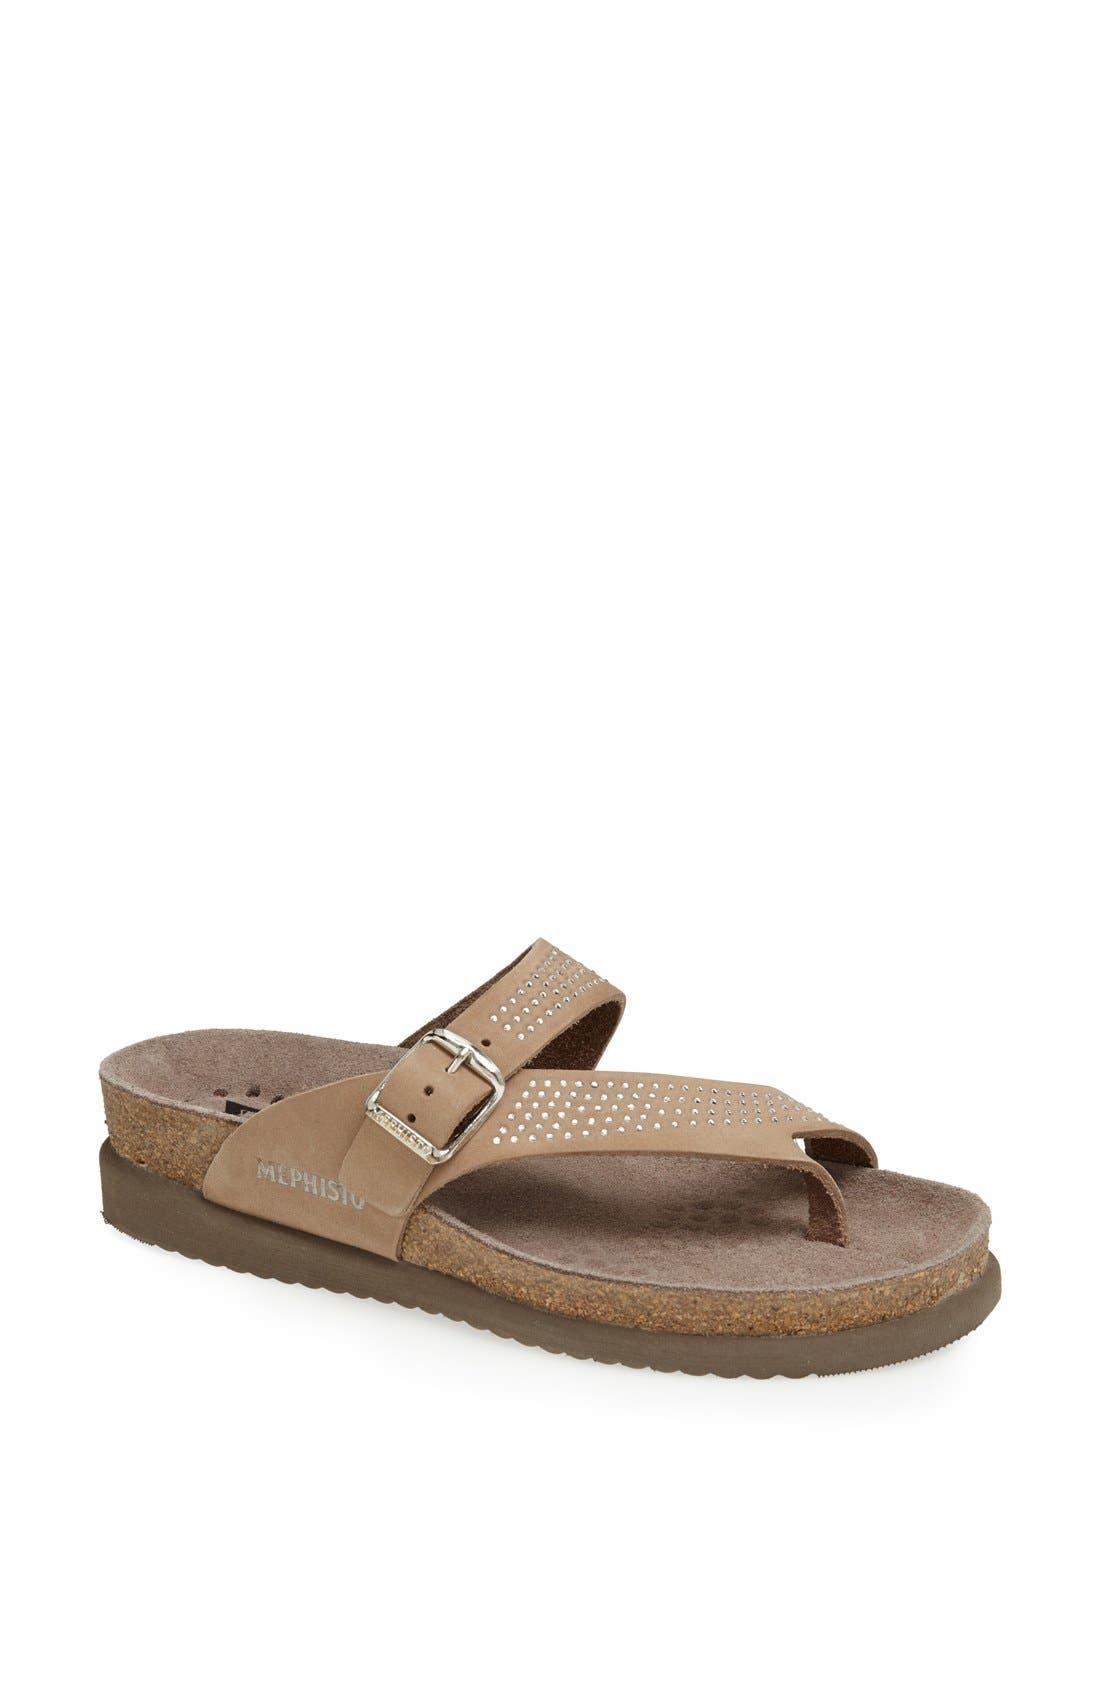 Main Image - Mephisto 'Helen - Spark' Leather Sandal